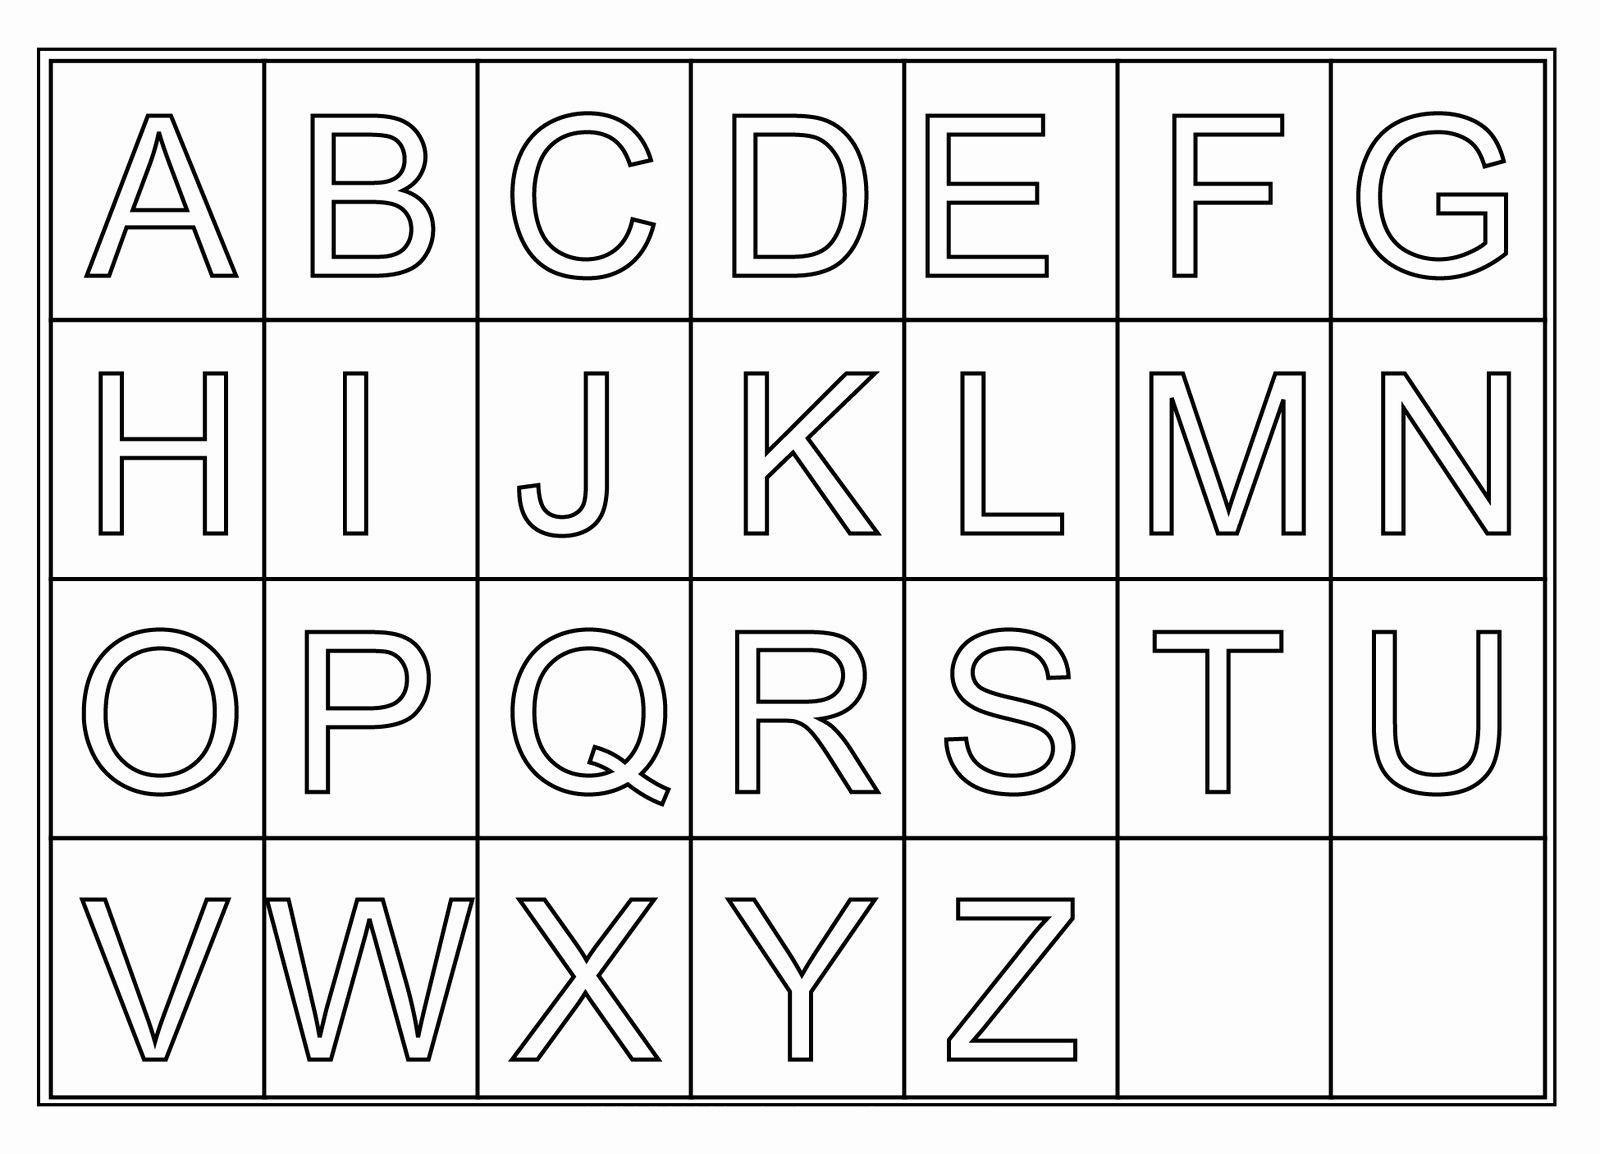 Alphabet Coloring Sheets A Z Pdf Unique Worksheets On Letters For Preschoolers Printable Alphabet Worksheets Free Alphabet Coloring Pages Alphabet Printables